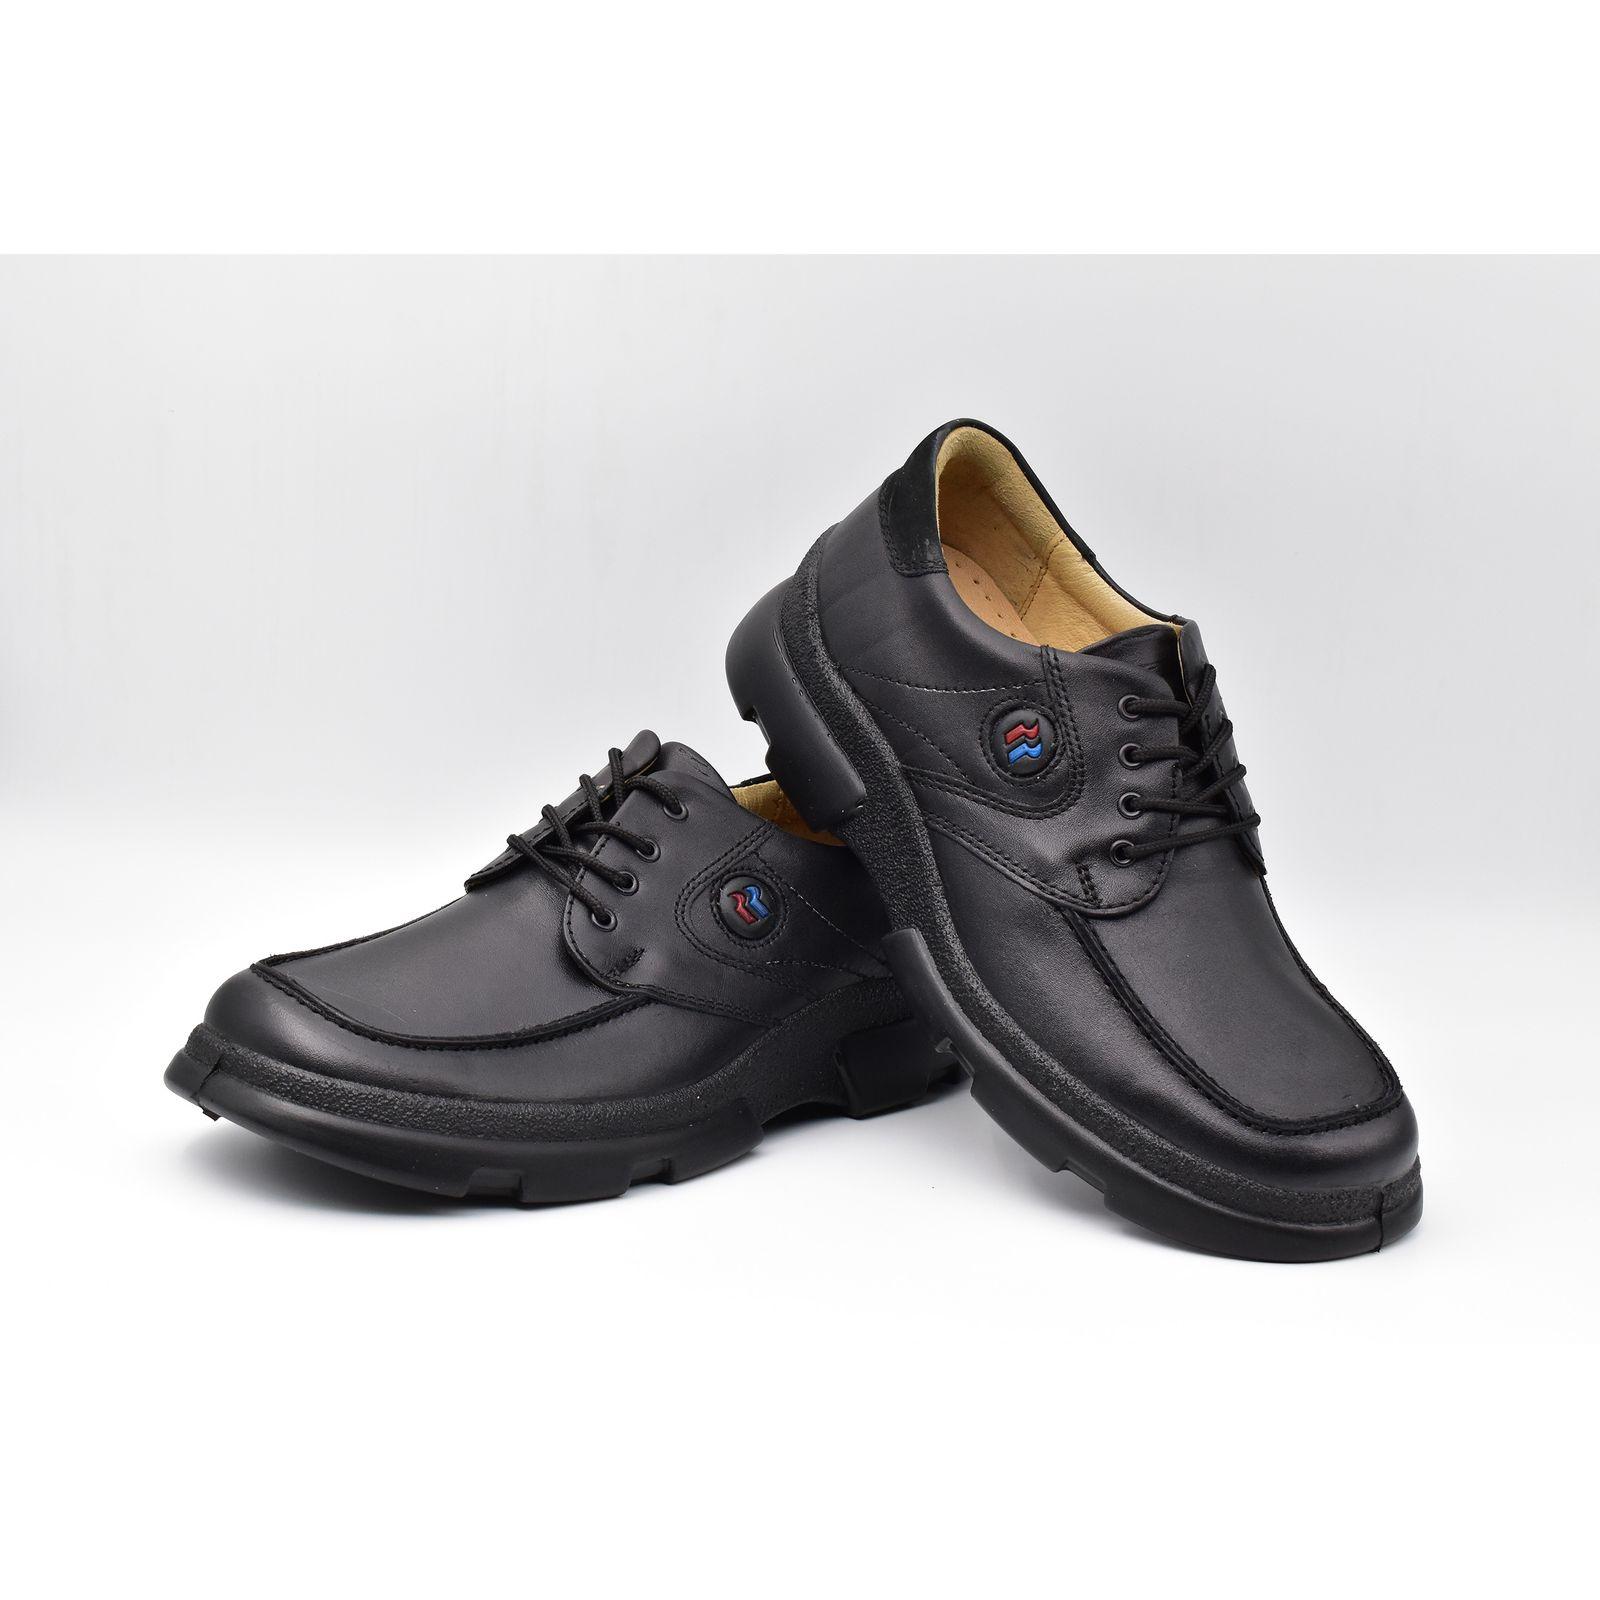 کفش روزمره مردانه البرز مدل تورنتو کد 7009 -  - 9